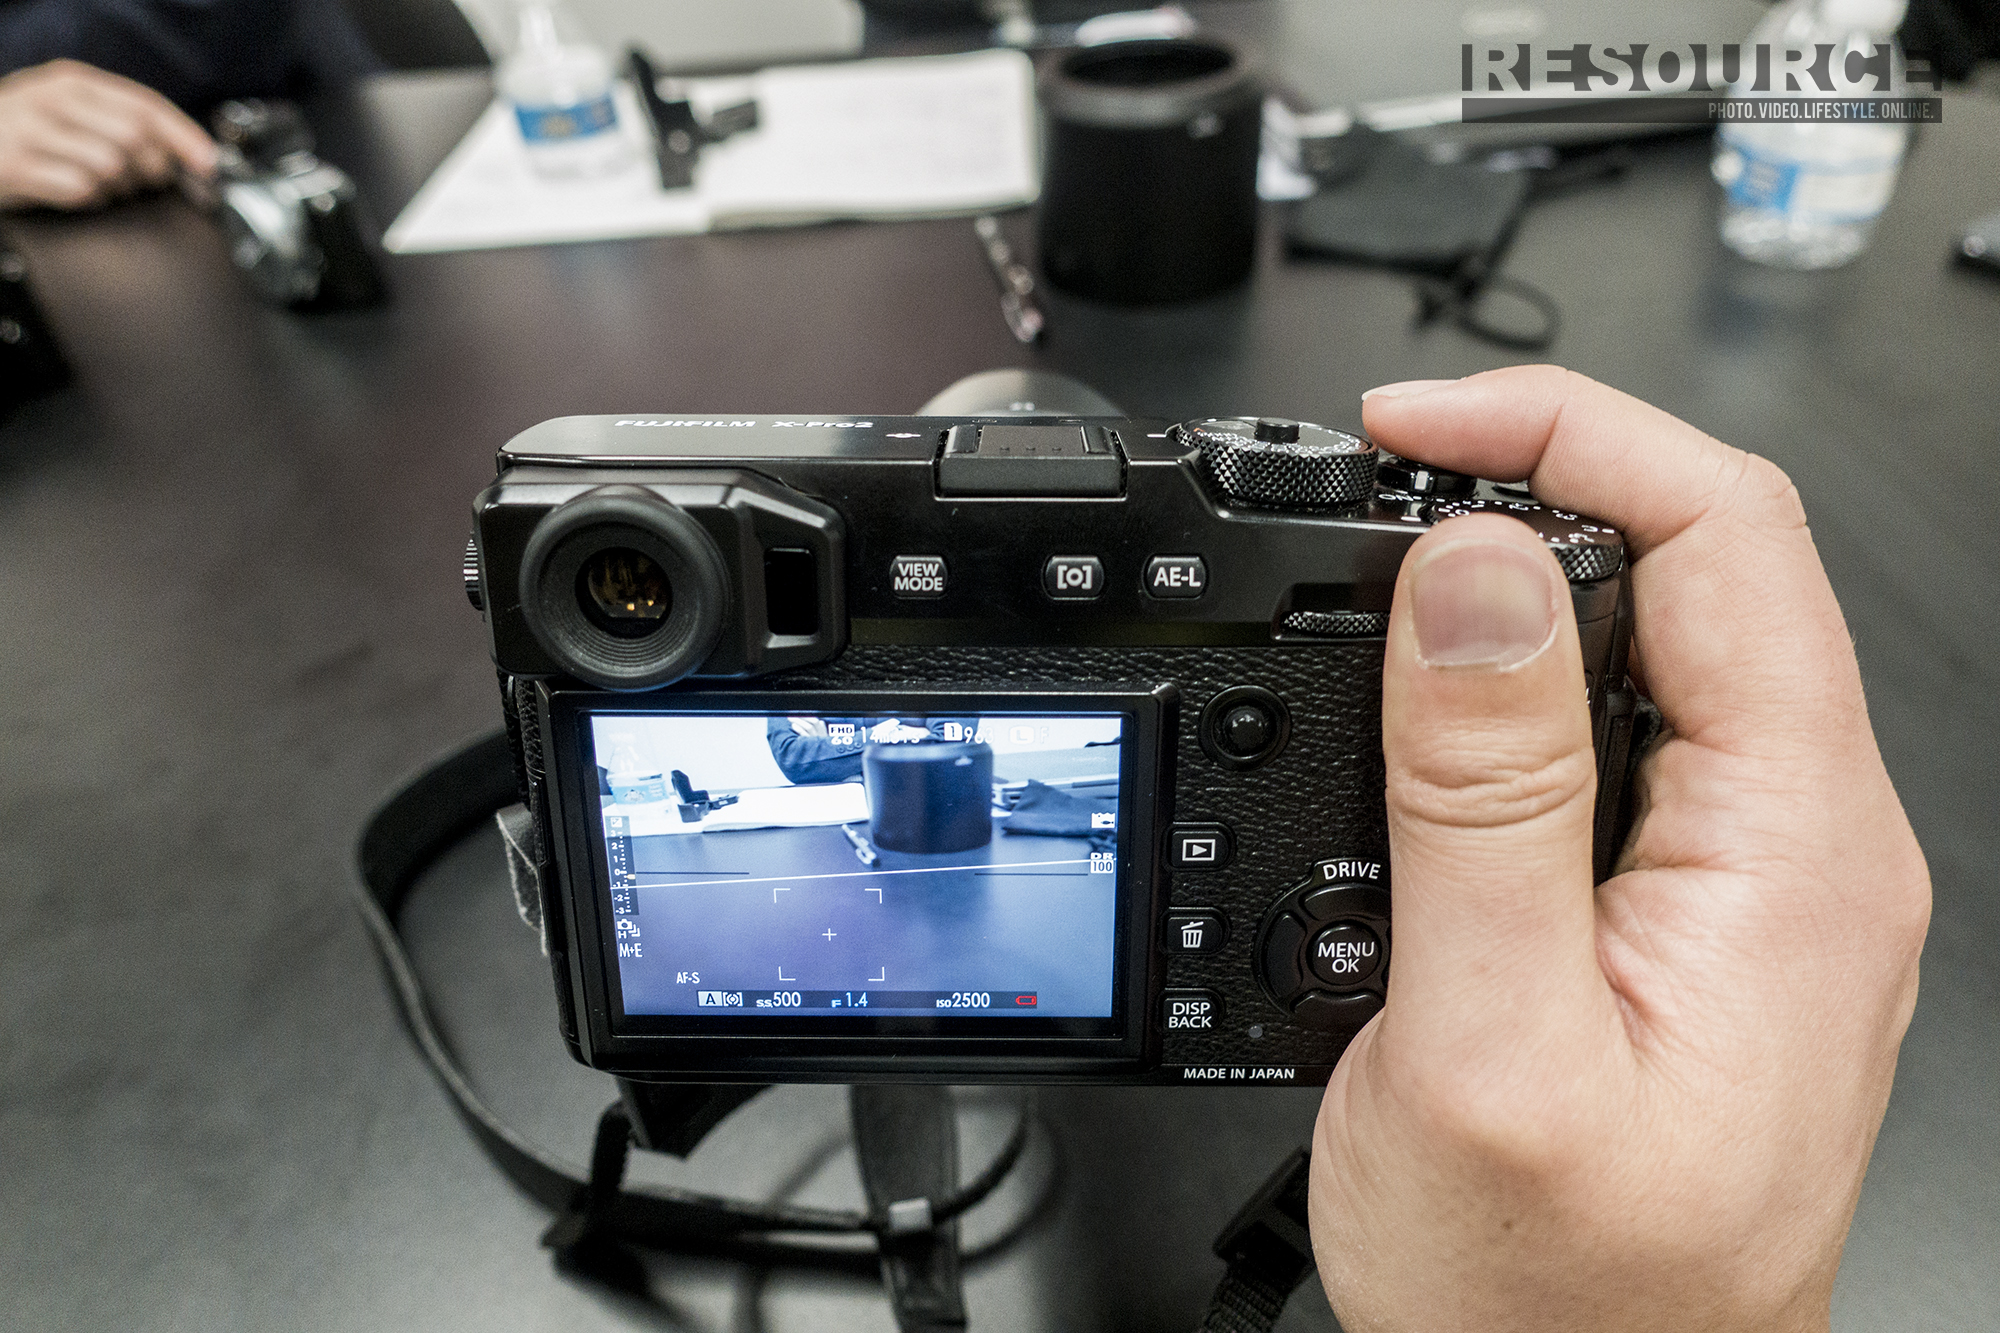 Fuji X-Pro2 Hands On